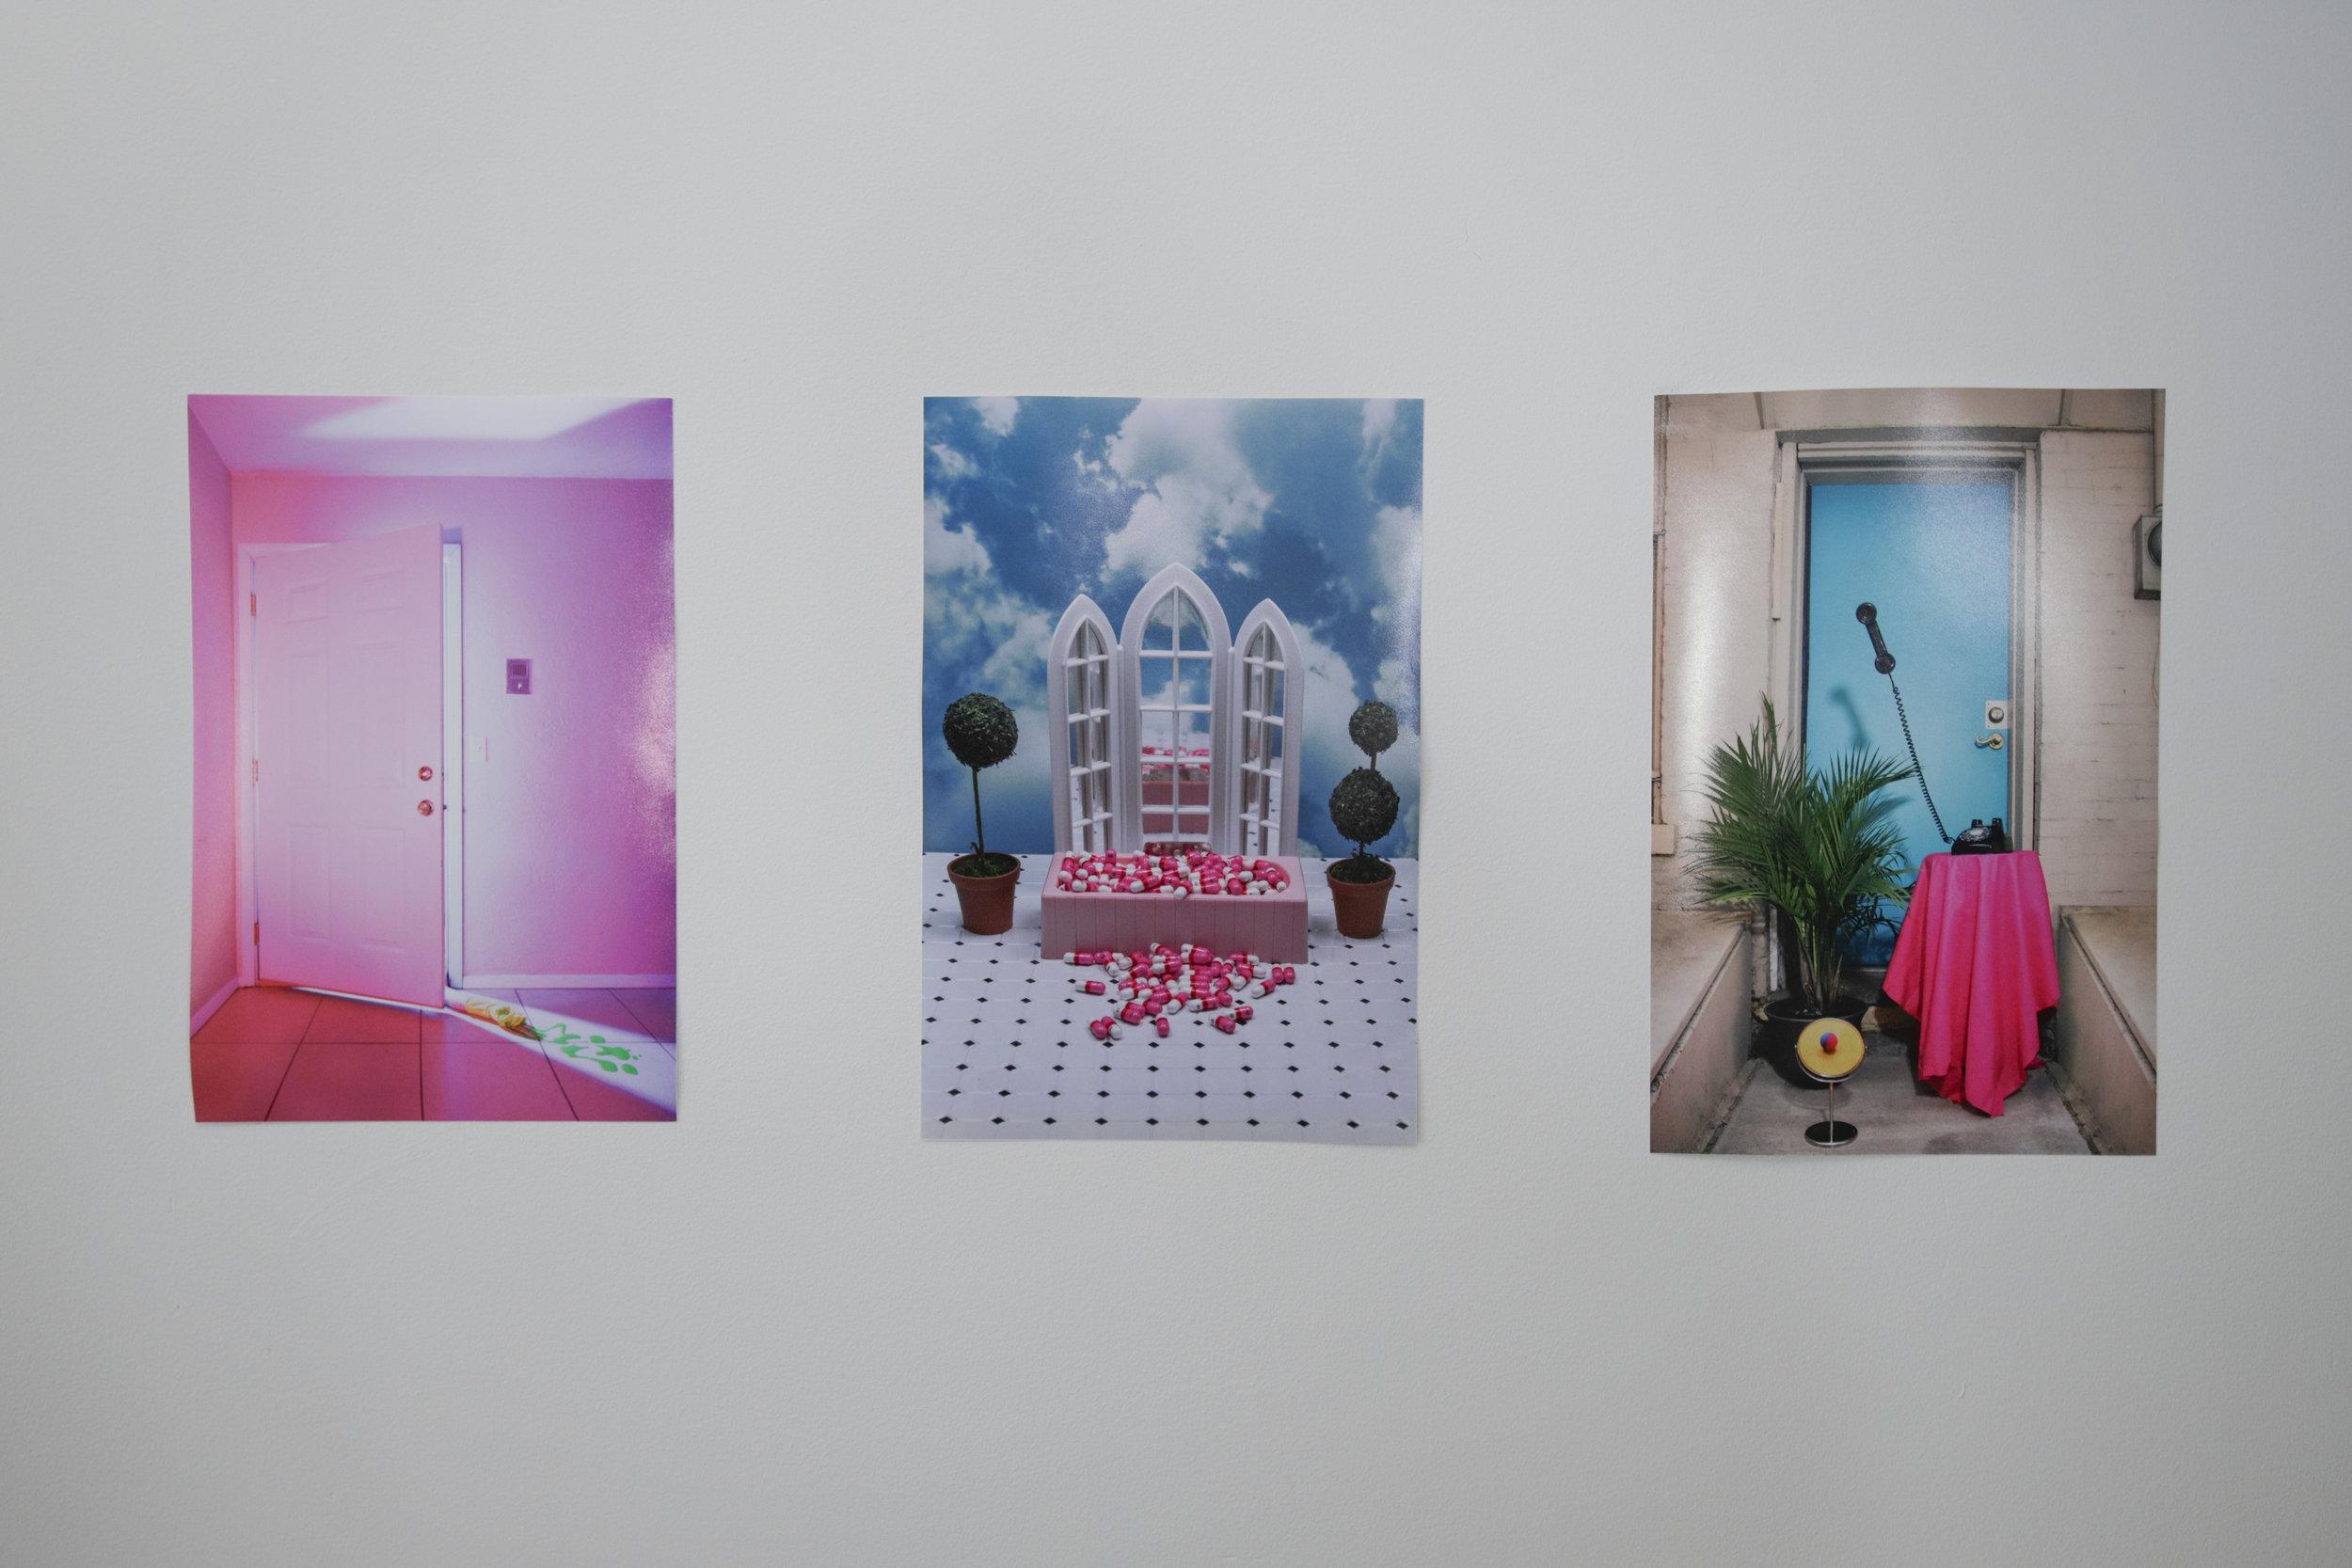 Untitled 1 , 2017, digital photography (left), Window Pain , 2017, digital photography (middle), CMYK , 2016, digital photography (right).Image courtesy of Shea Grehan.